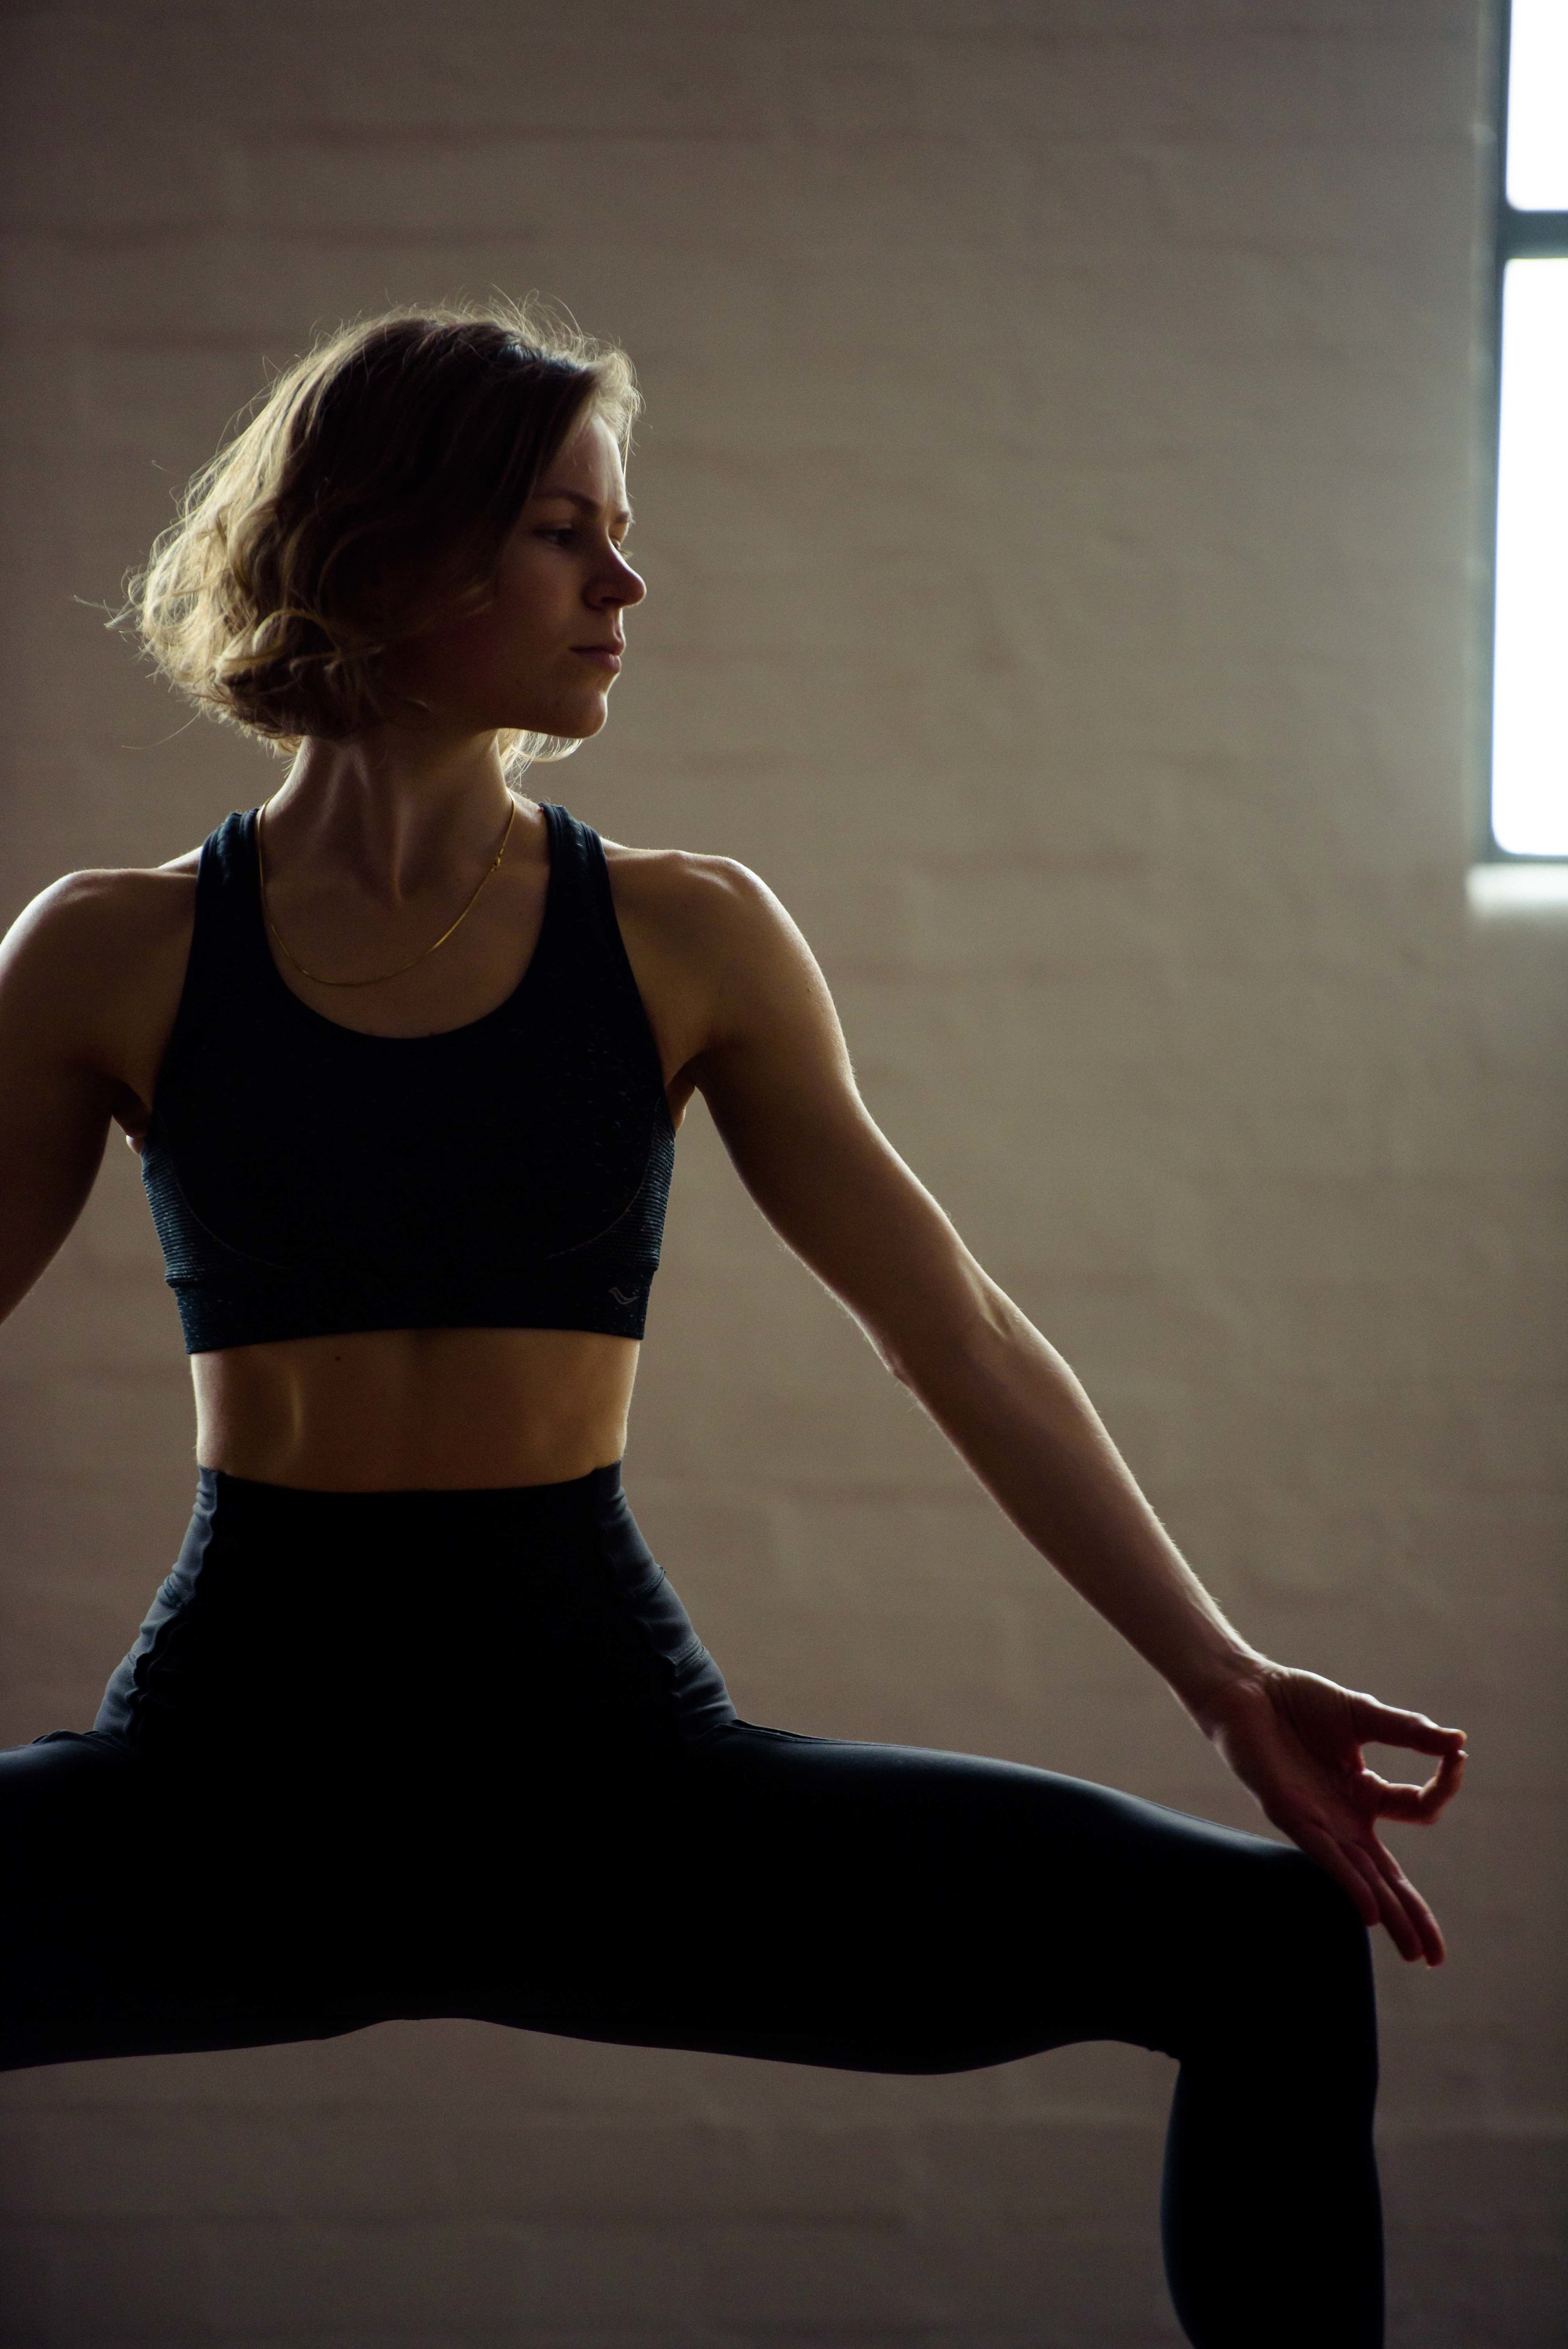 Best yoga photographers on Instagram